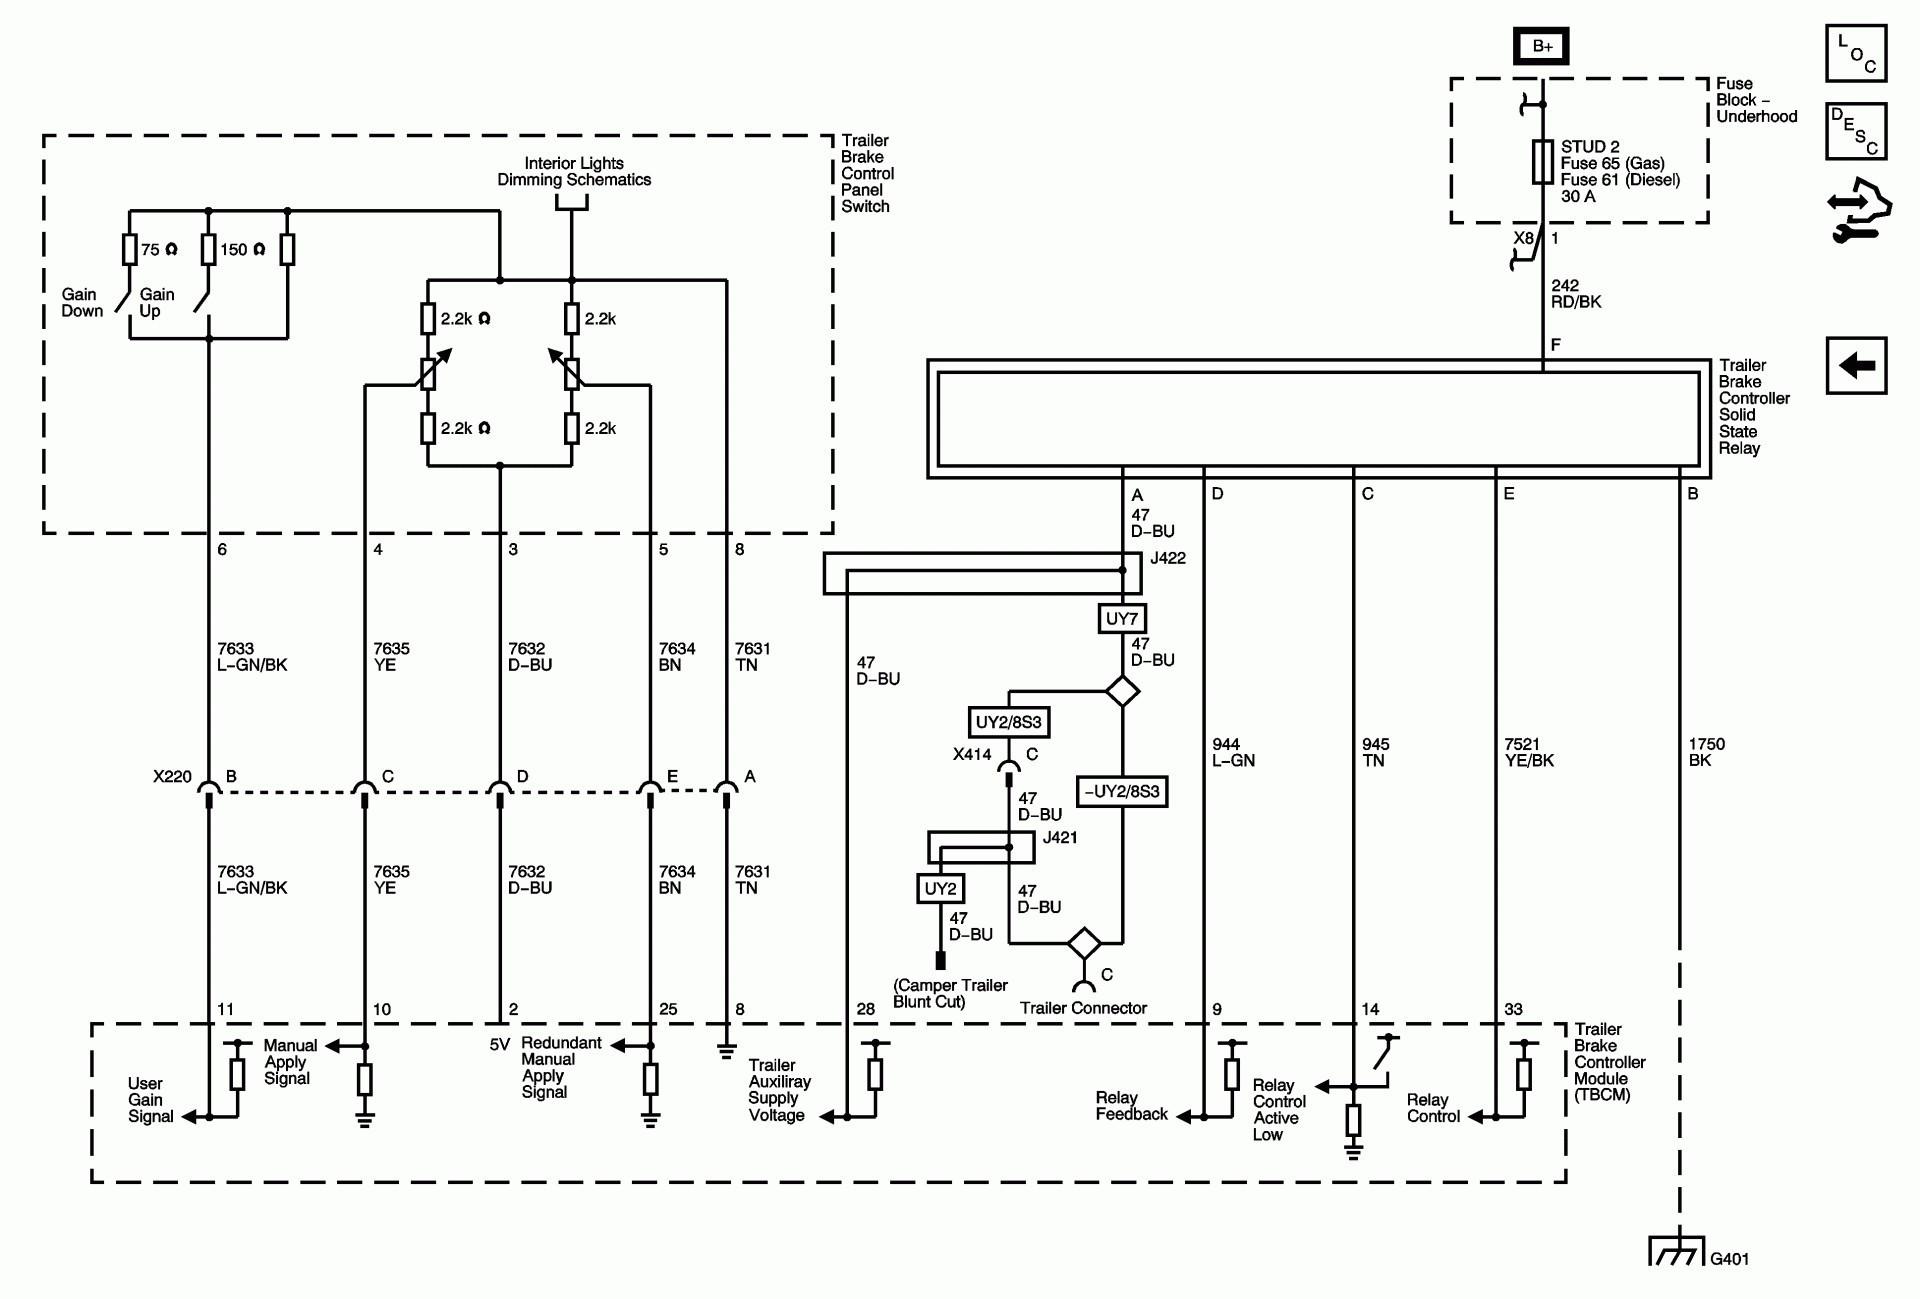 hight resolution of wiring diagram trailer brakes refrence tekonsharodigy2 wiring diagram with3 trailer brake controller reese